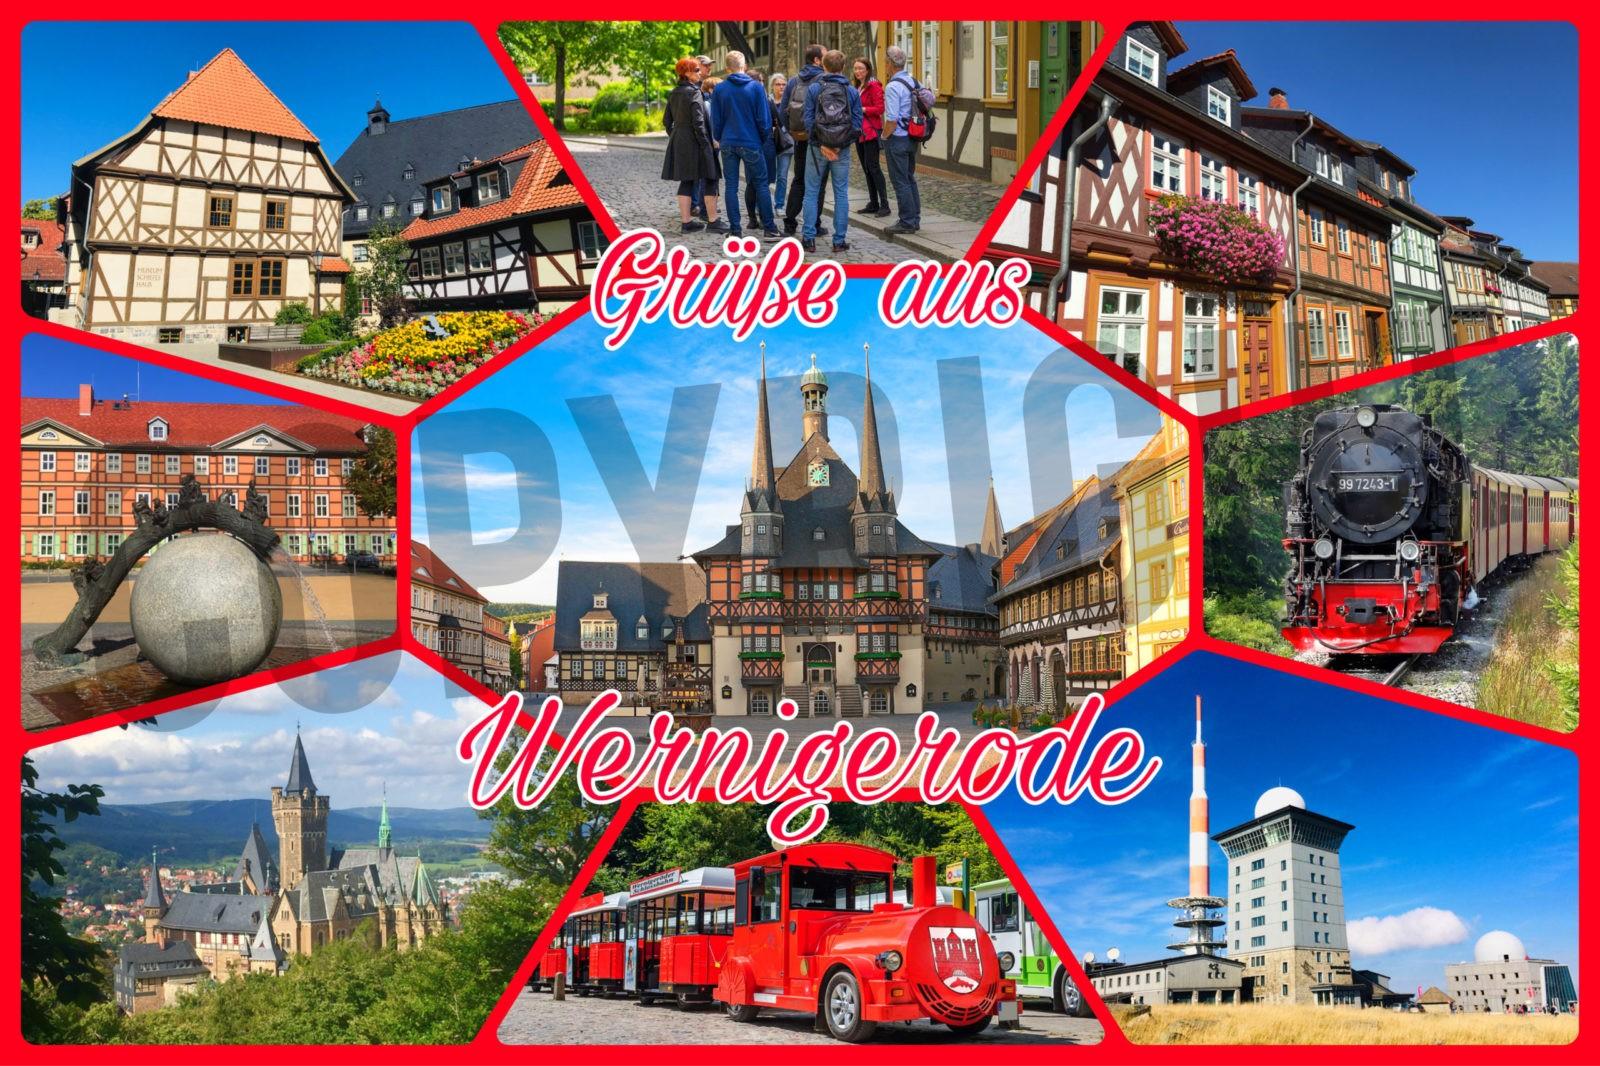 stadtfuehrung-wernigerode stadtfuehrer stadtfuehrungen Postkarte